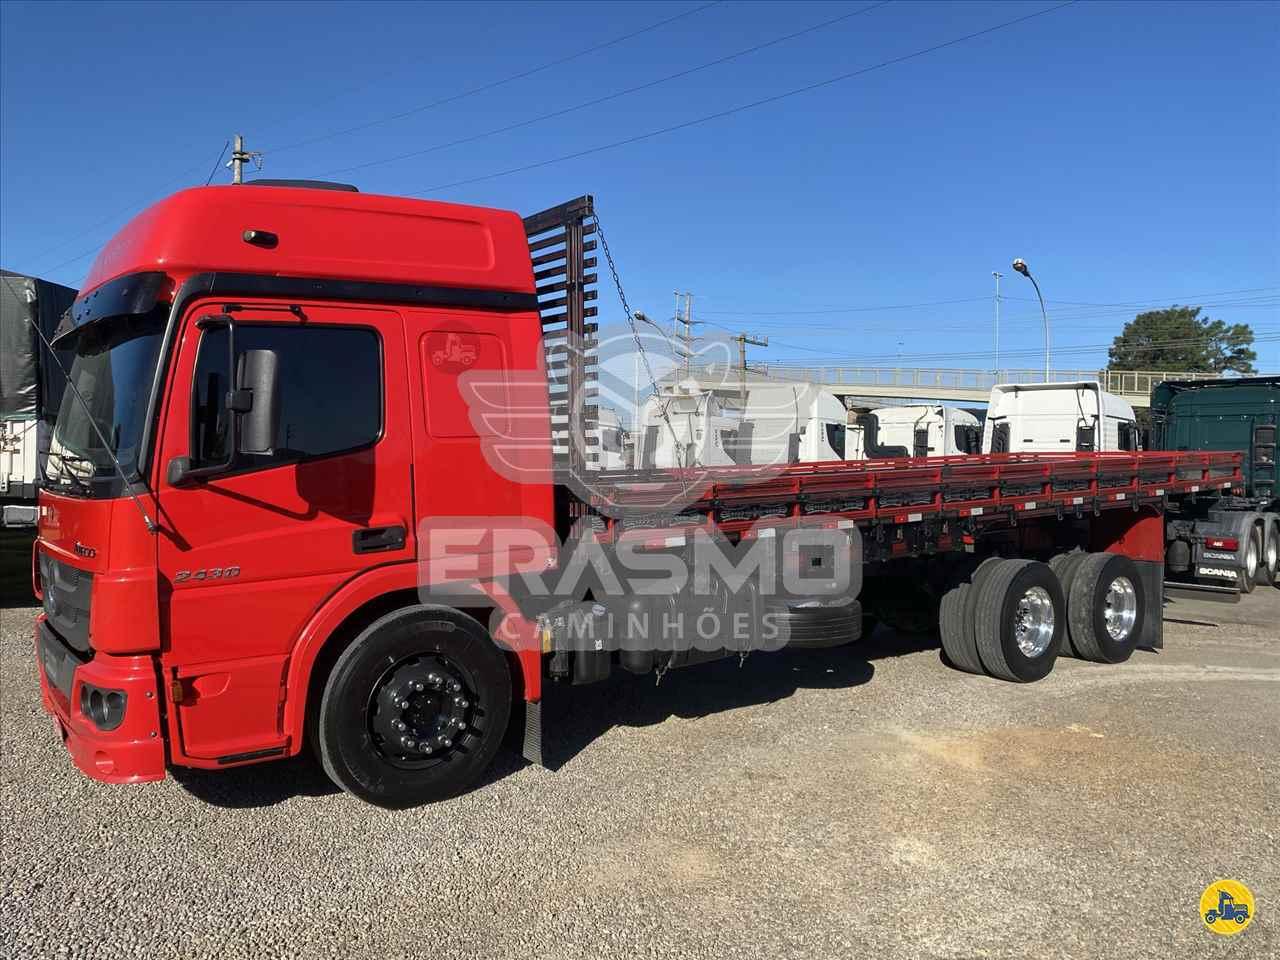 CAMINHAO MERCEDES-BENZ MB 2430 Carga Seca Truck 6x2 Erasmo Caminhões TUBARAO SANTA CATARINA SC